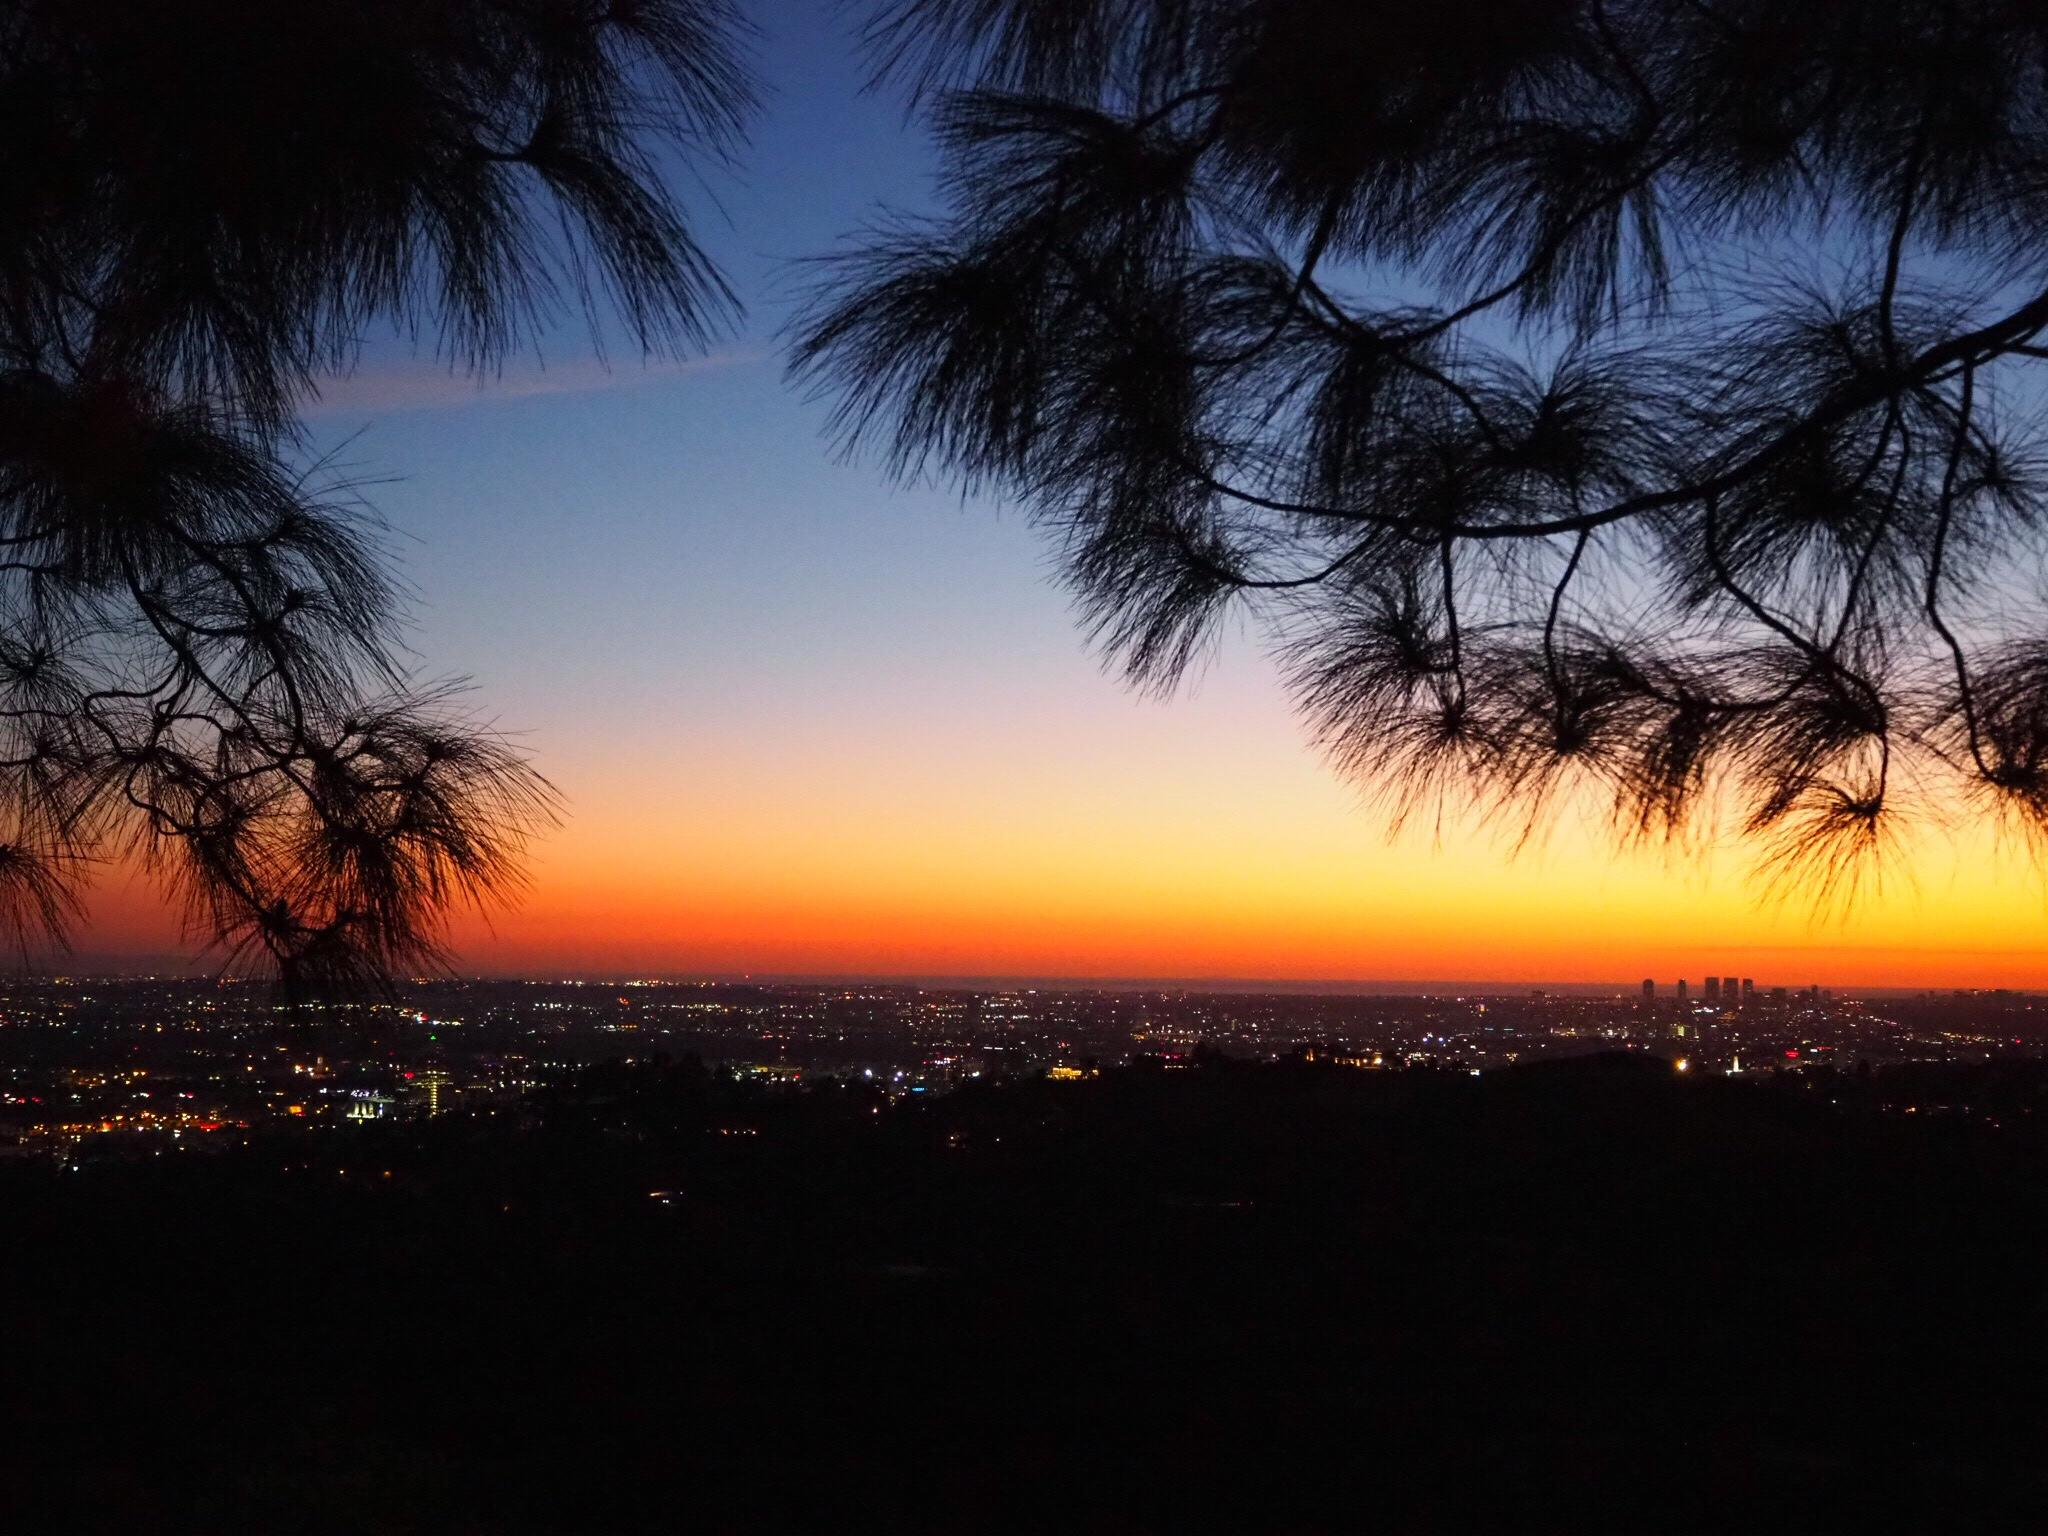 img 2369 - 24hours in LA - ロサンゼルスで過ごした24時間